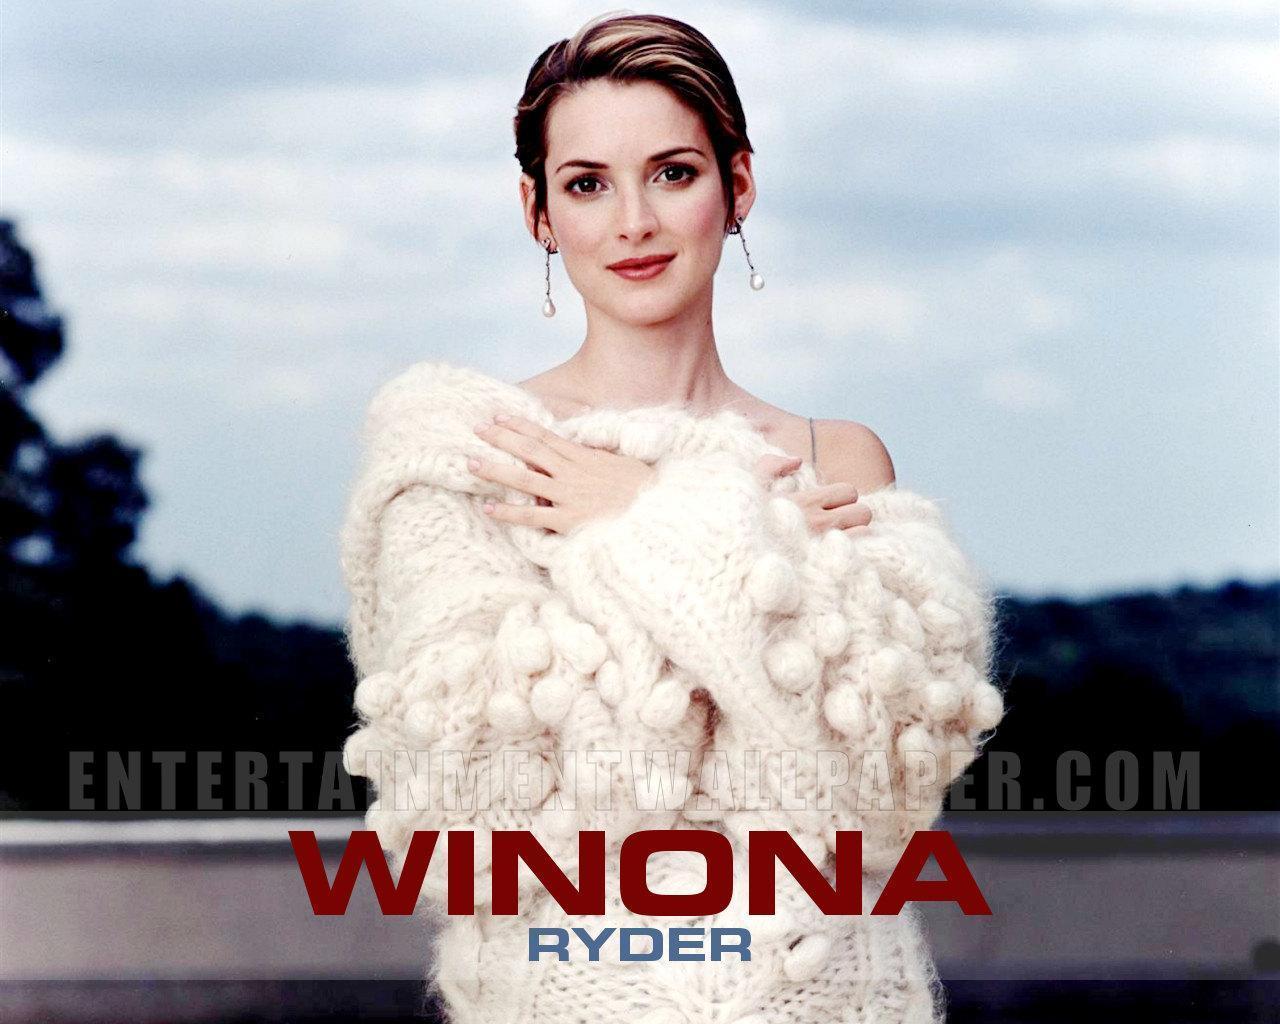 Winona Ryder - winona-ryder wallpaper